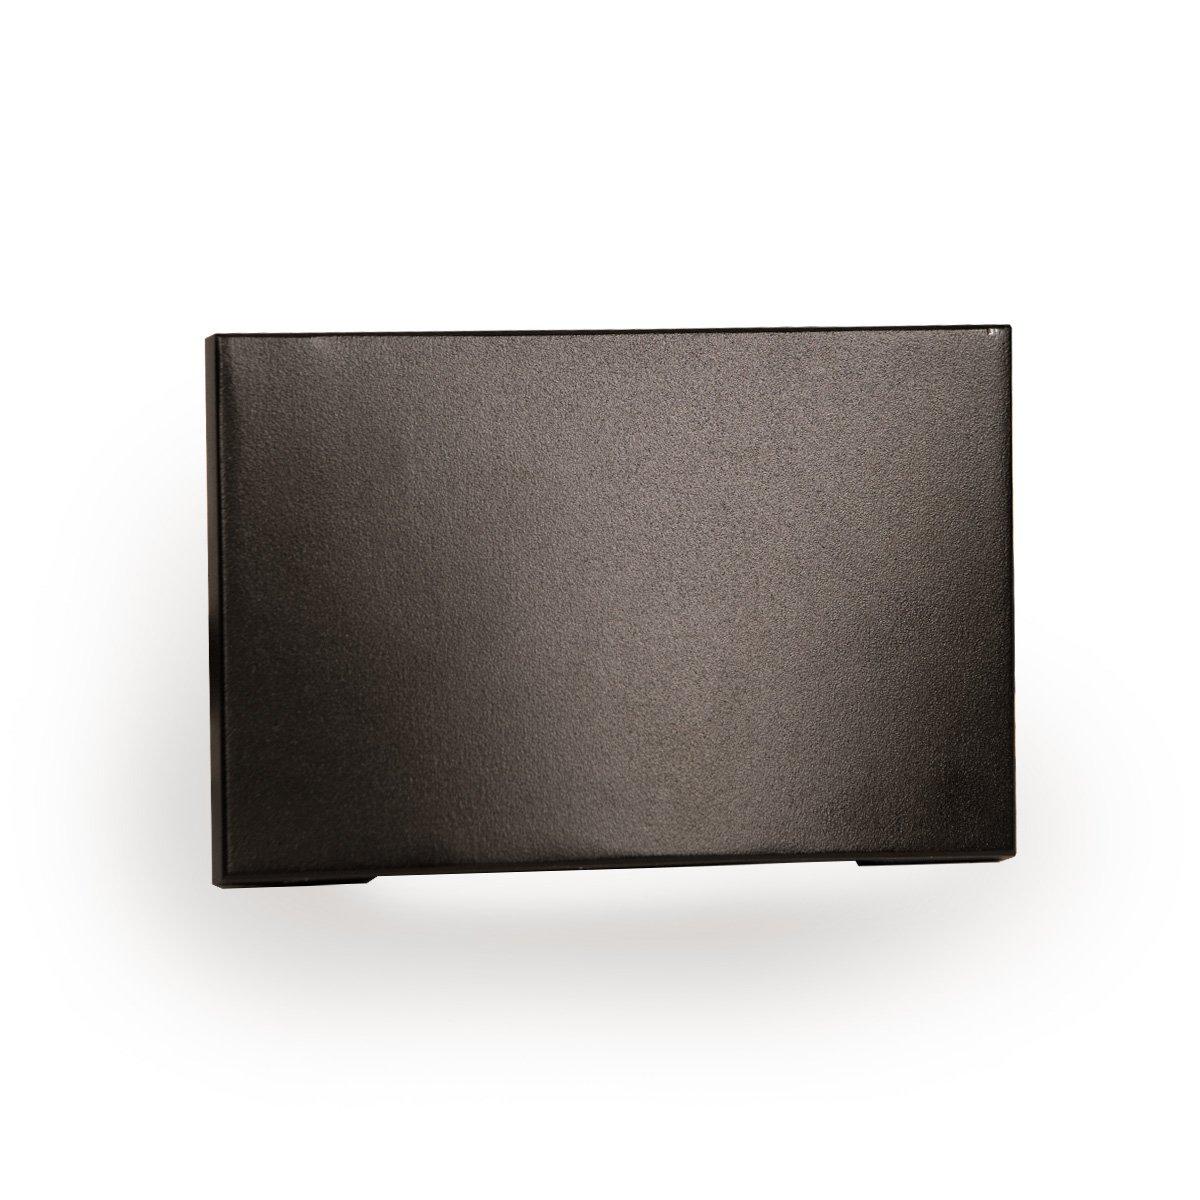 WAC Lighting WL-LED110-C-BZ LED Horizontal Scoop Step and Wall Light 120V 3000K, Bronze